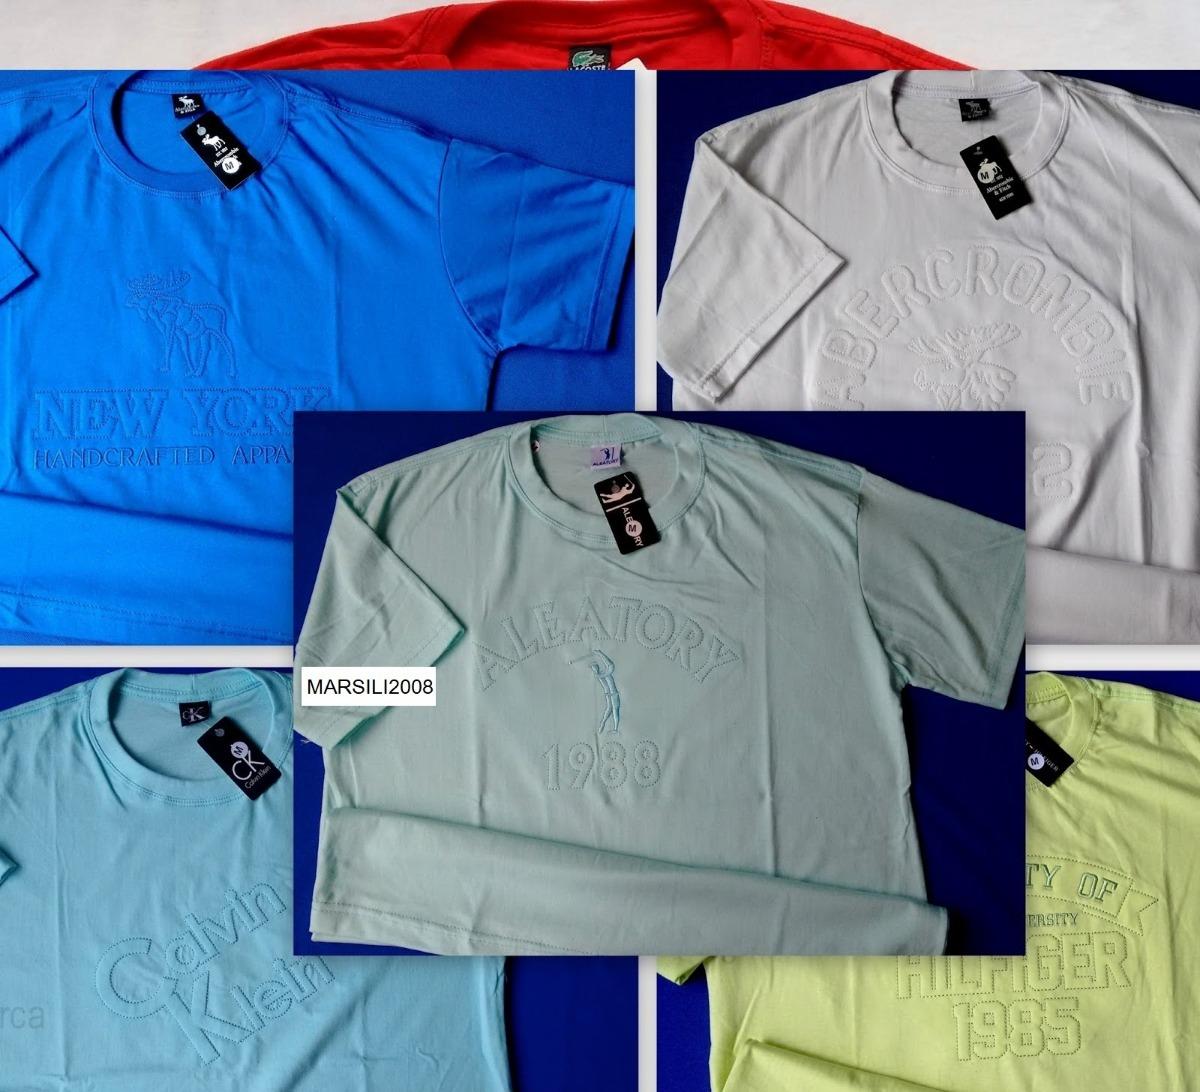 Kit 20 Camisetas Com Estampas Alto Relevo Grifes Famosas - R  449 5be430d7add